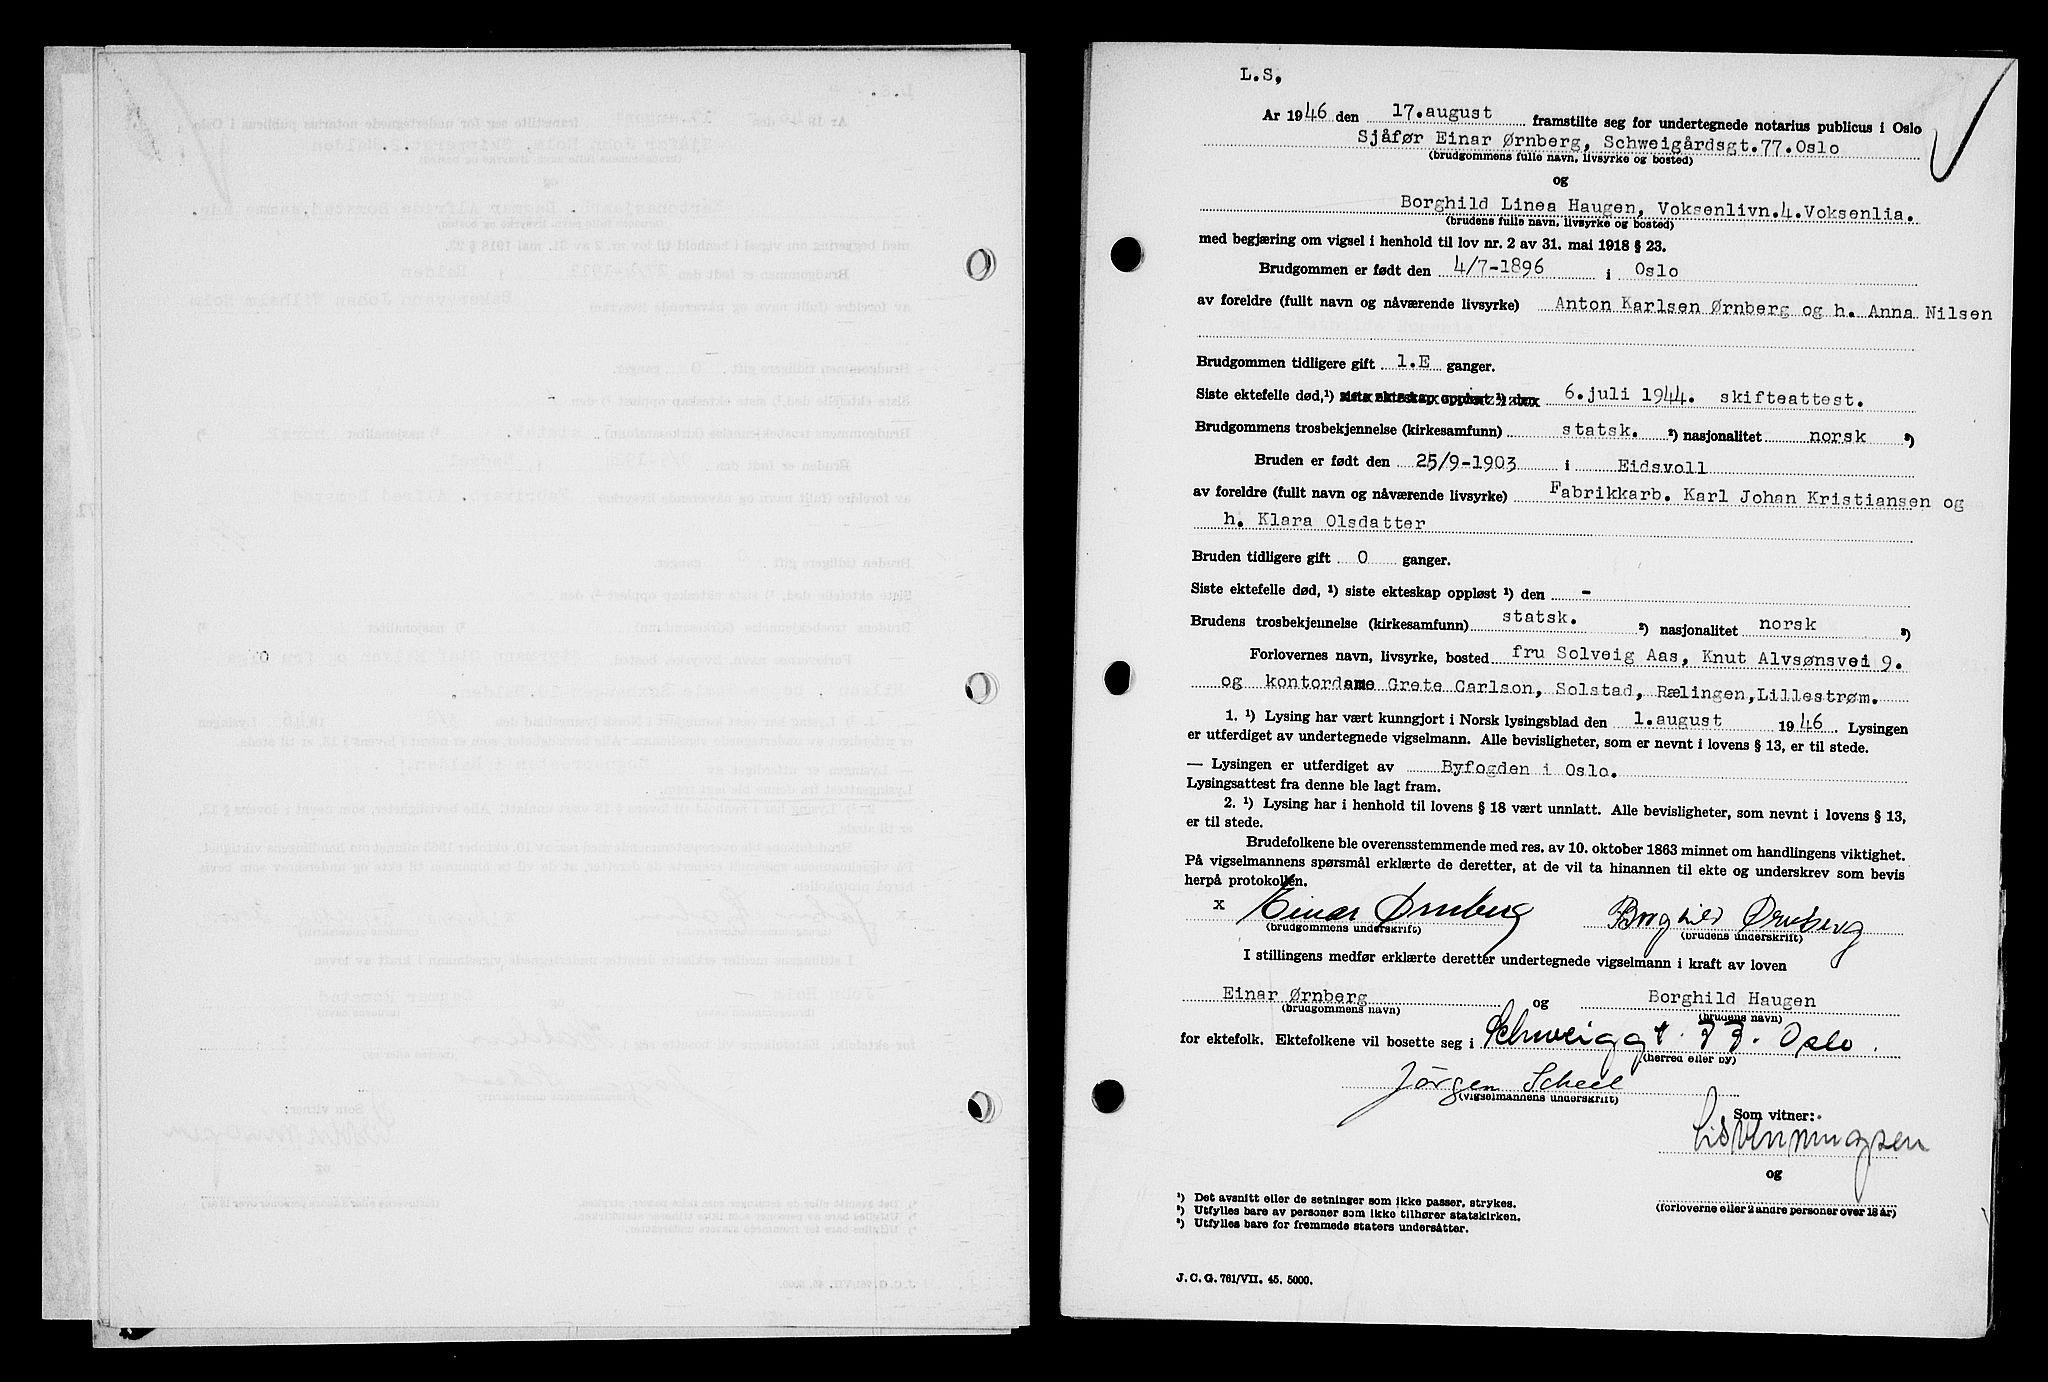 SAO, Oslo byfogd avd. I, L/Lb/Lbb/L0057: Notarialprotokoll, rekke II: Vigsler, 1946